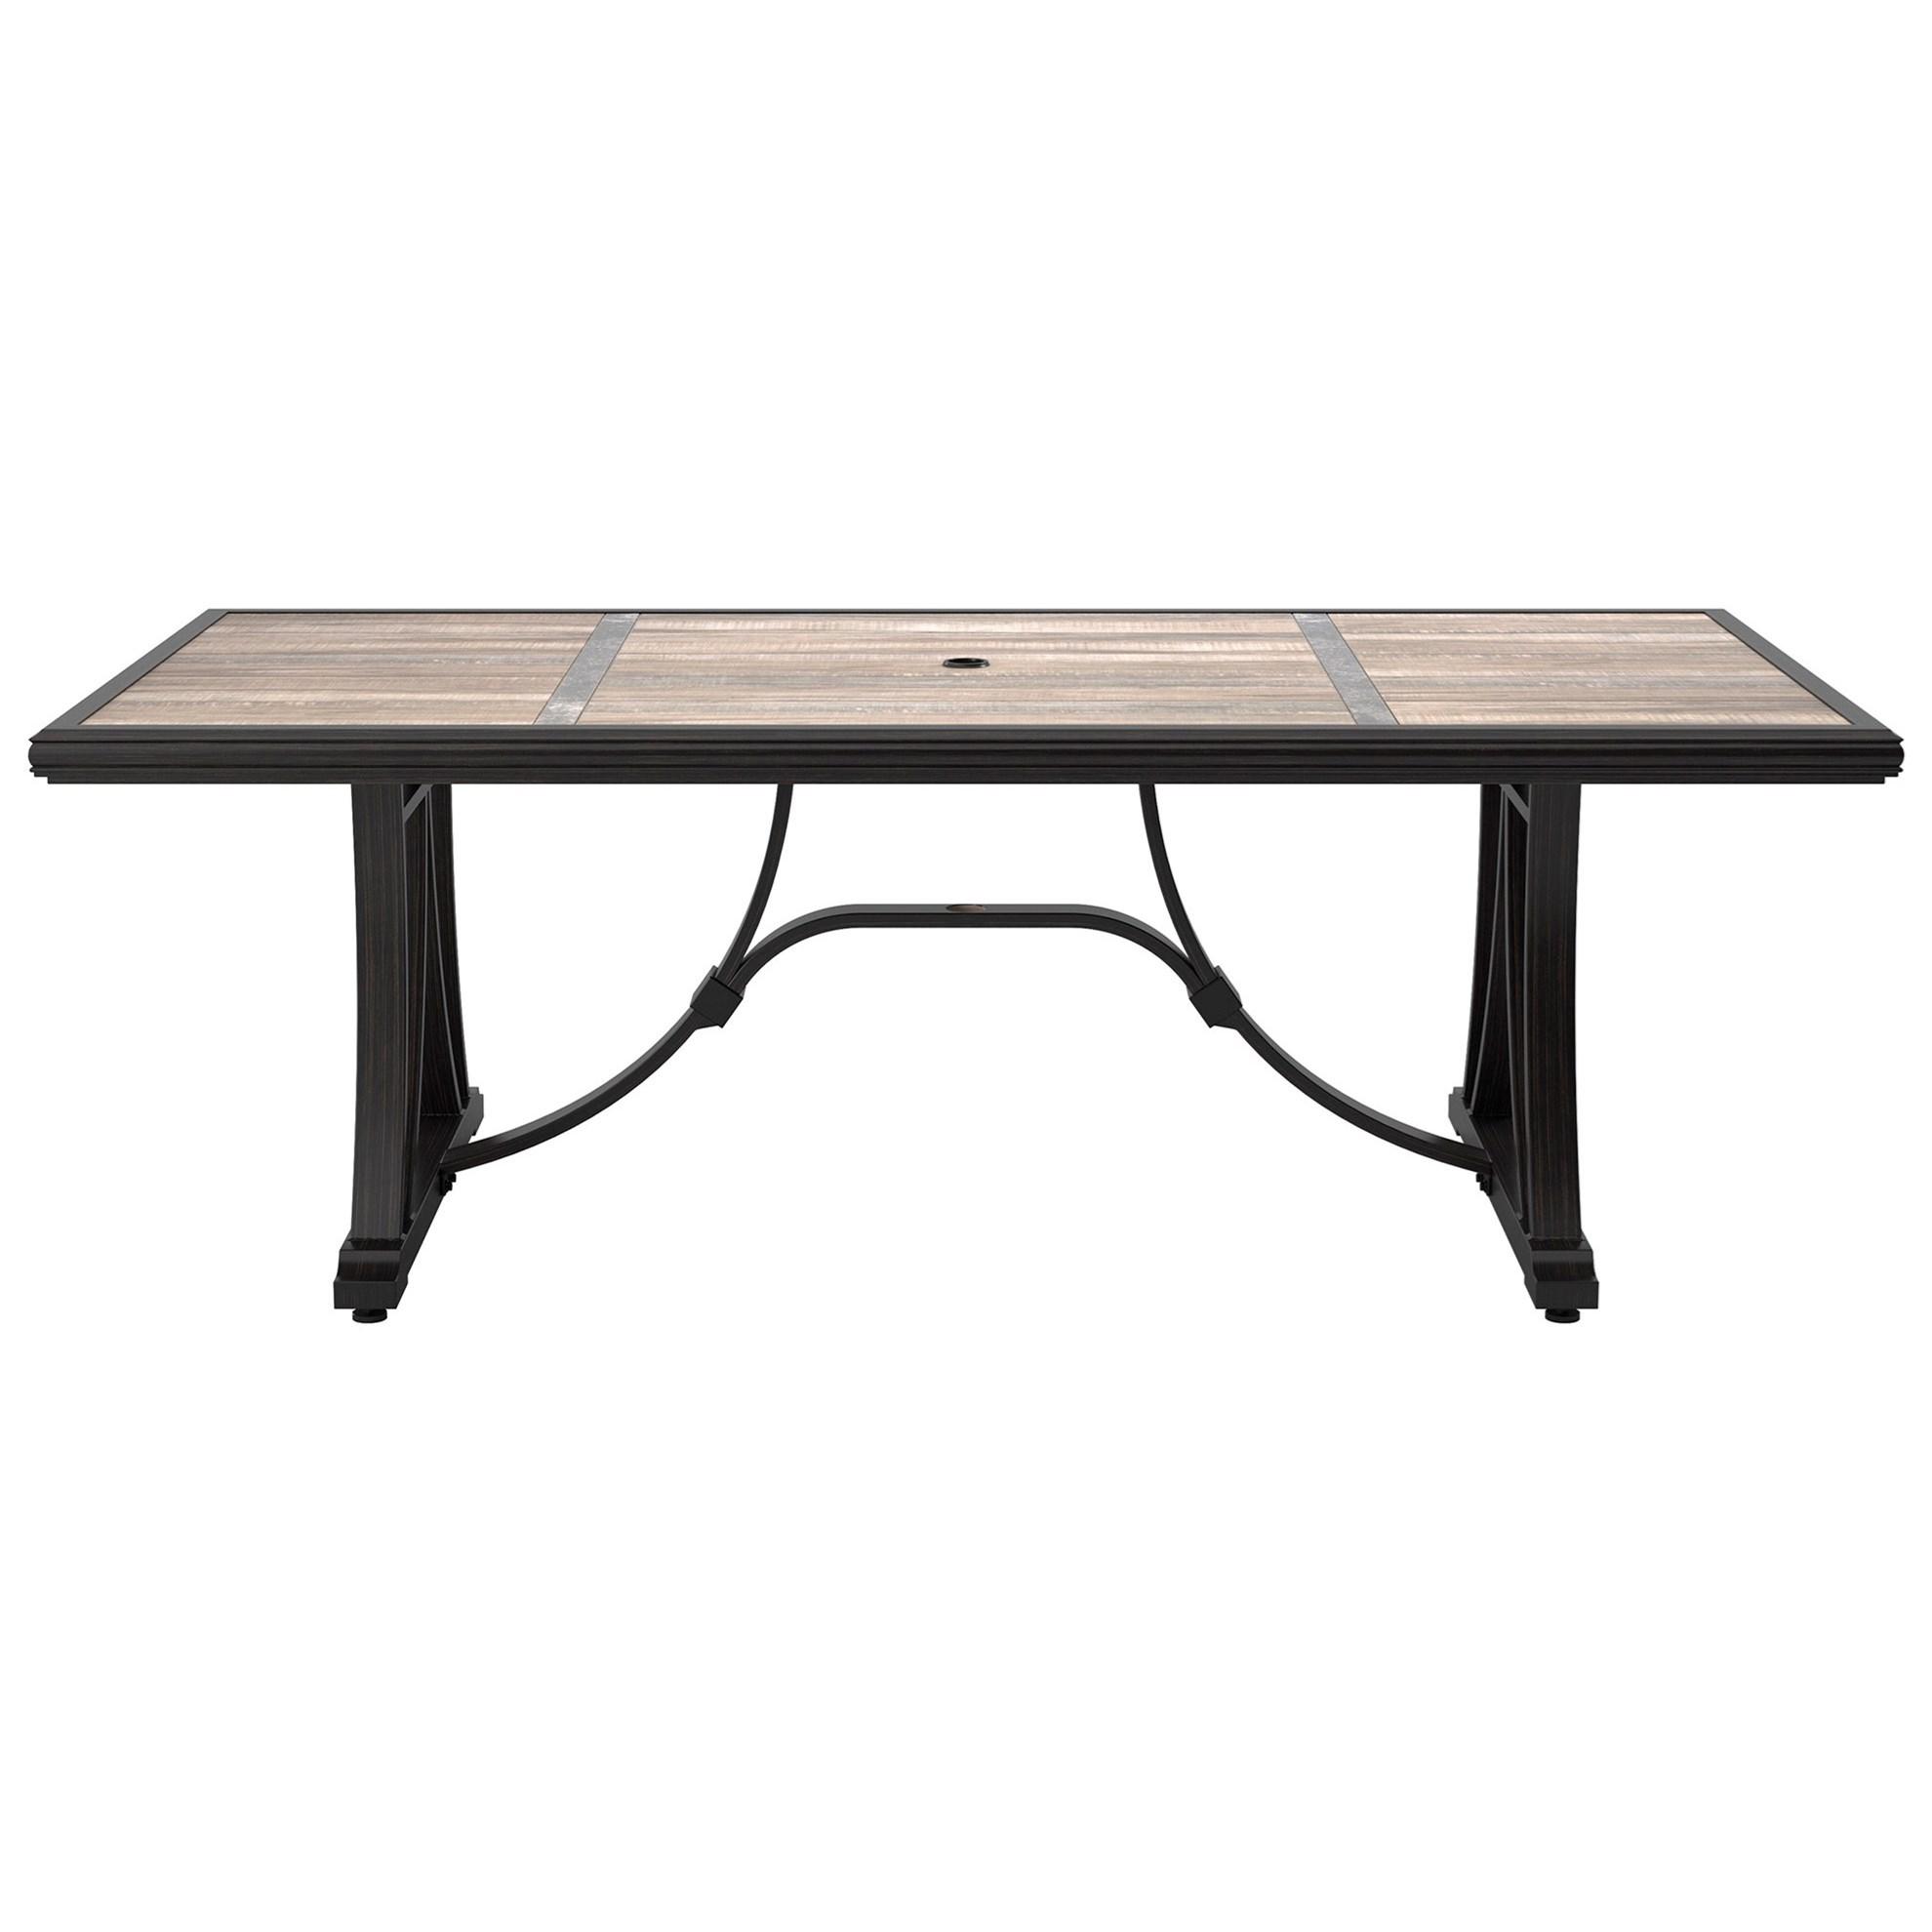 StyleLine Marsh Creek P775 625 Rectangular Dining Table